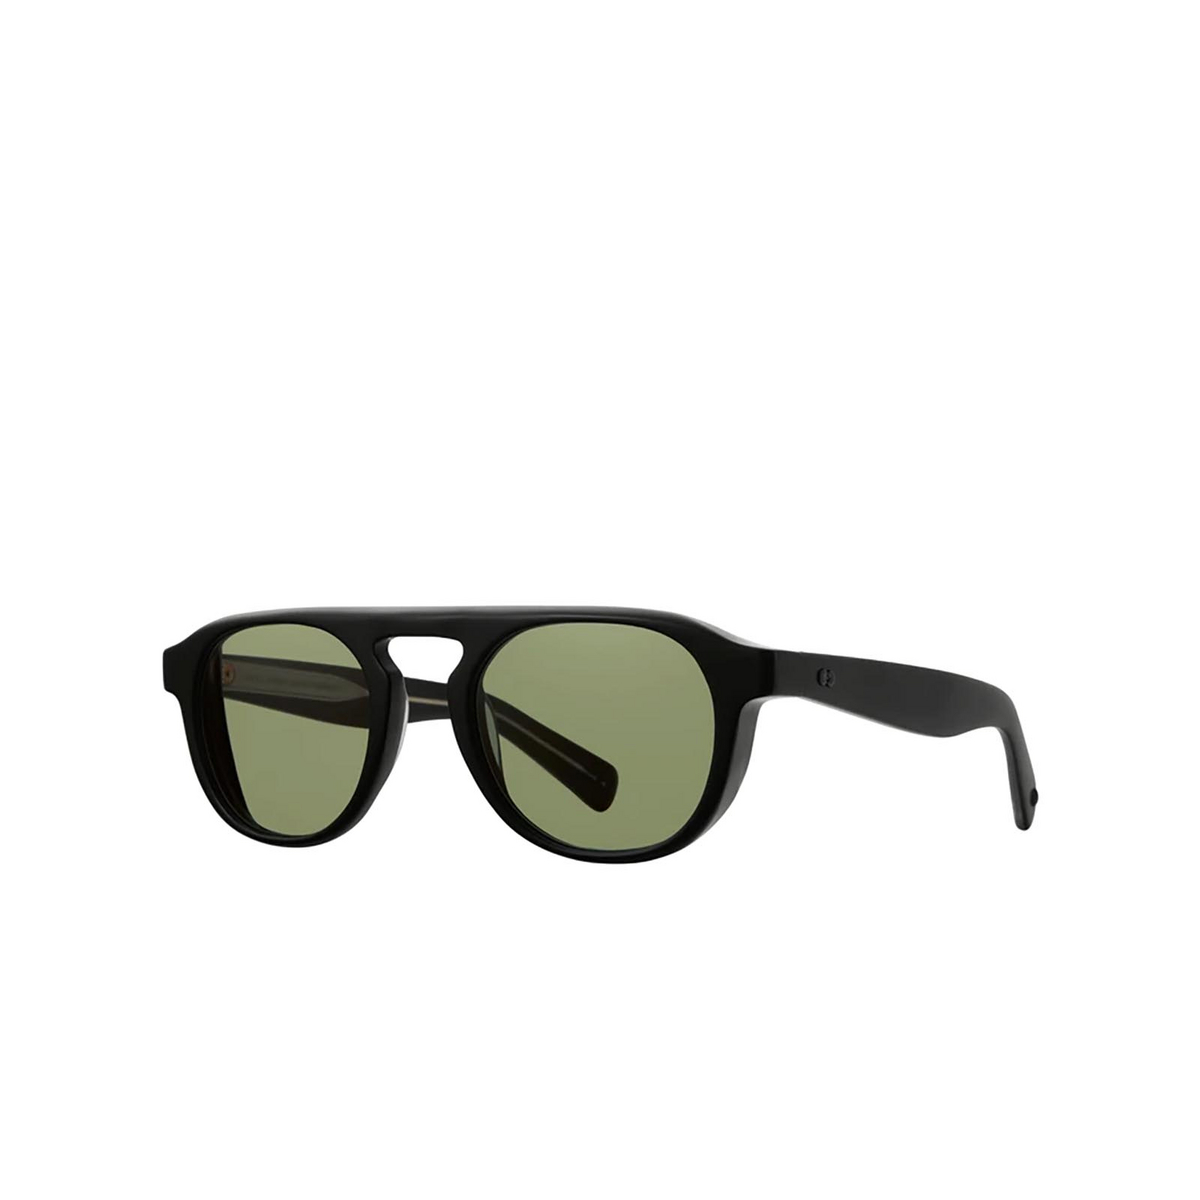 Garrett Leight® Aviator Sunglasses: Harding X Sun color Matte Black Mbk-vvg.